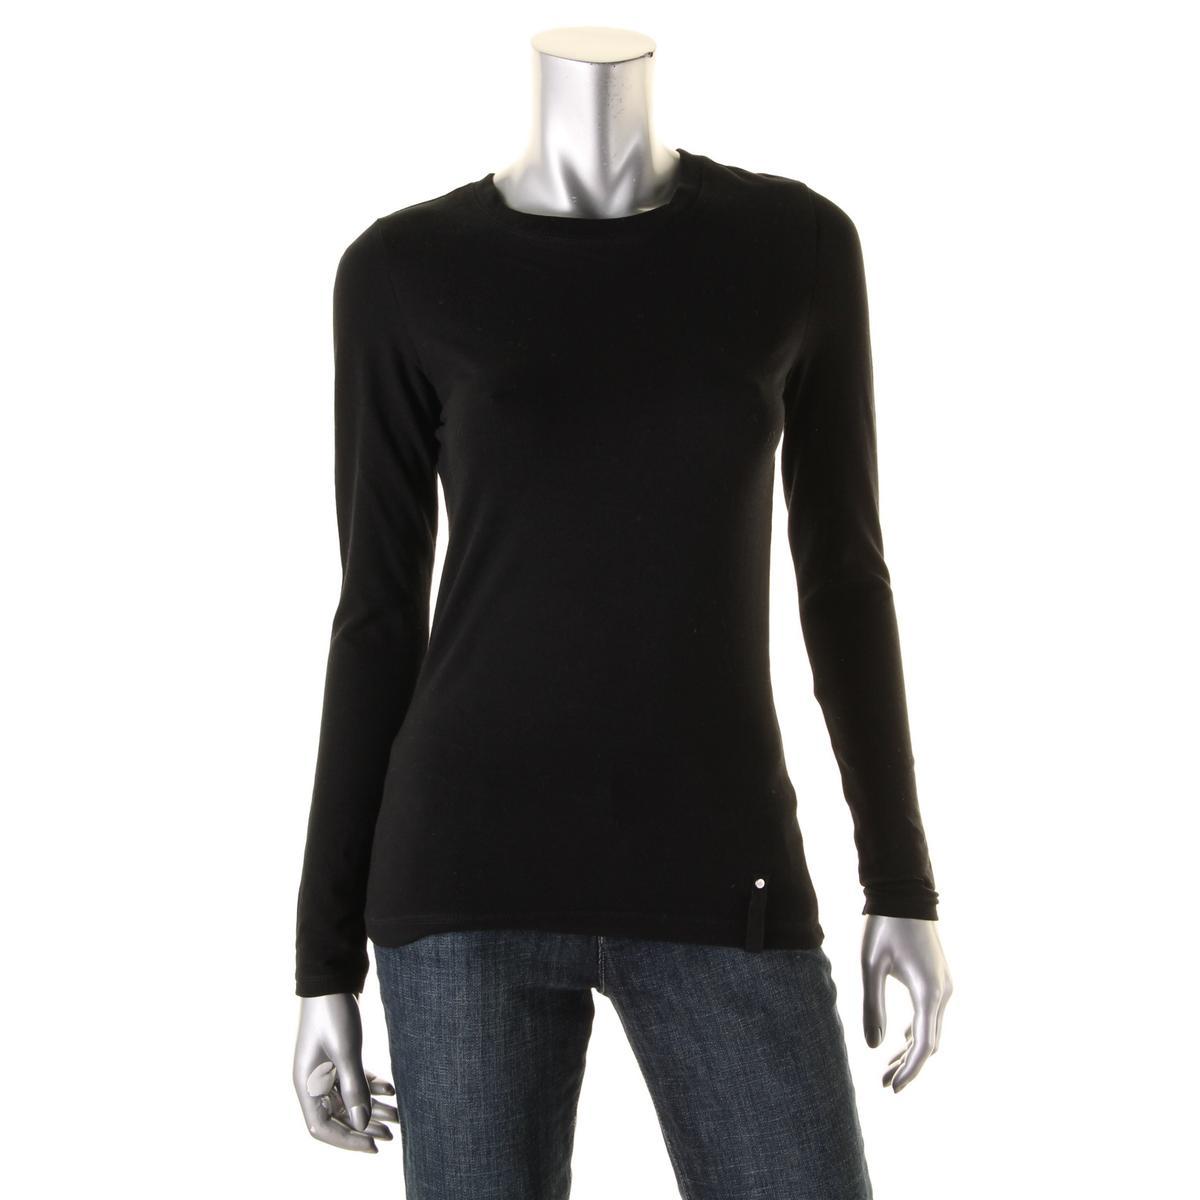 L Rl Lauren Active 6797 Womens Black Long Sleeve Pullover